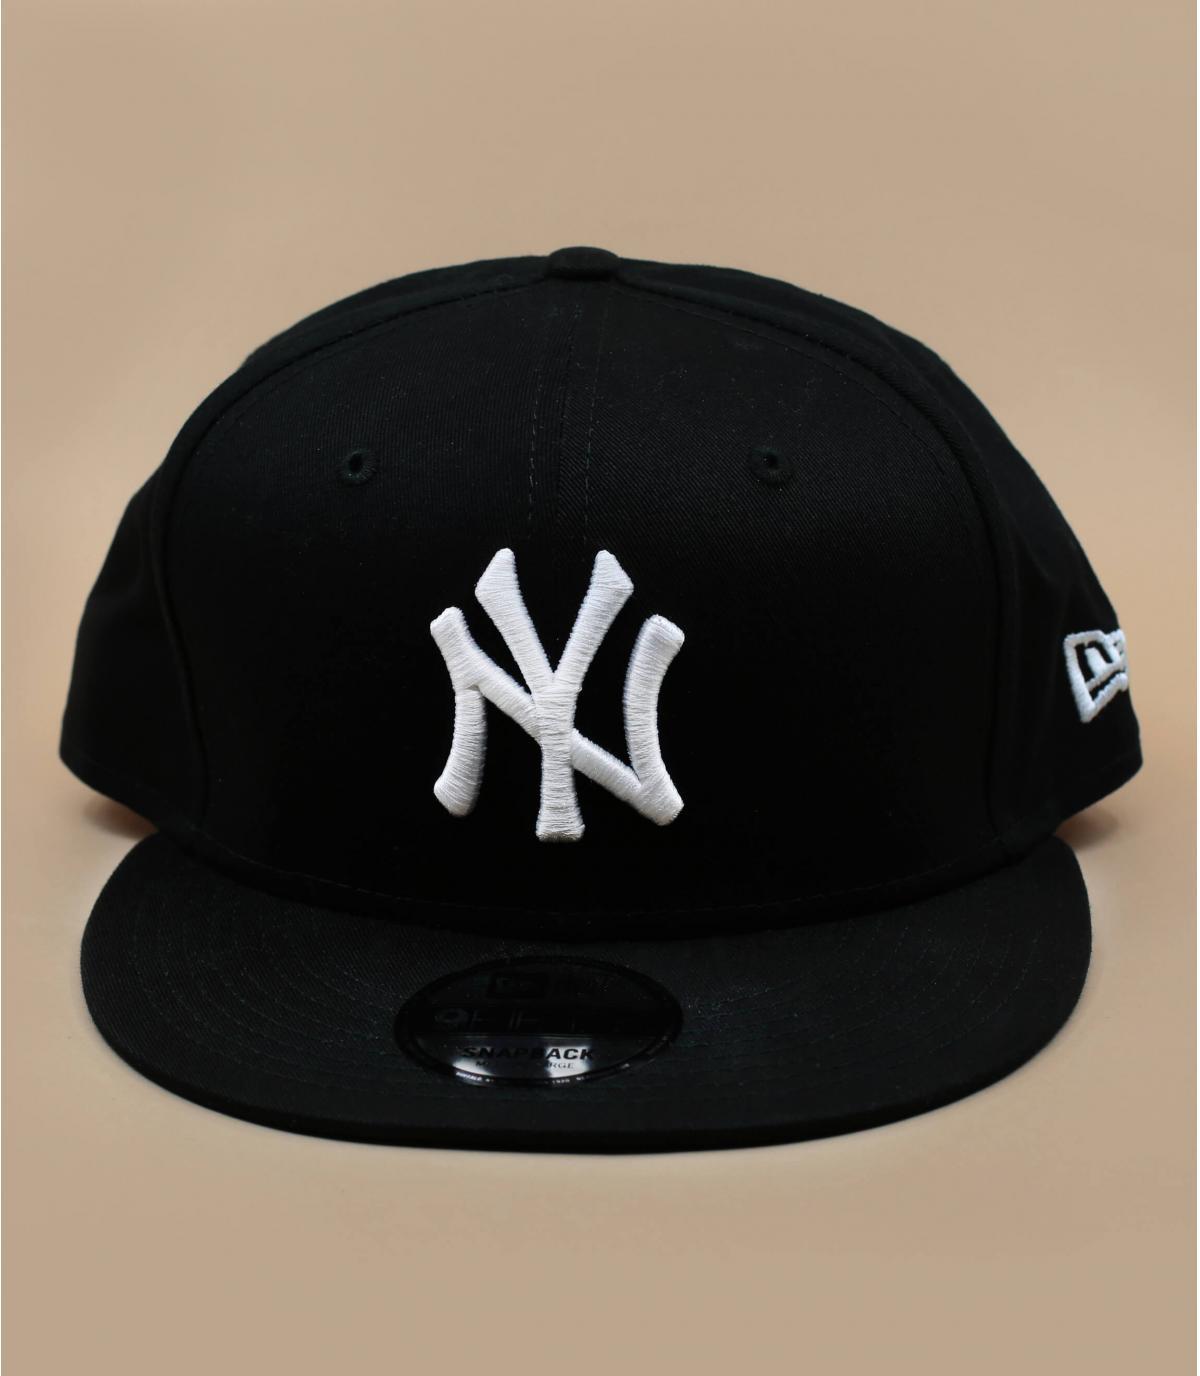 Détails Snapback NY MLB black white - image 2